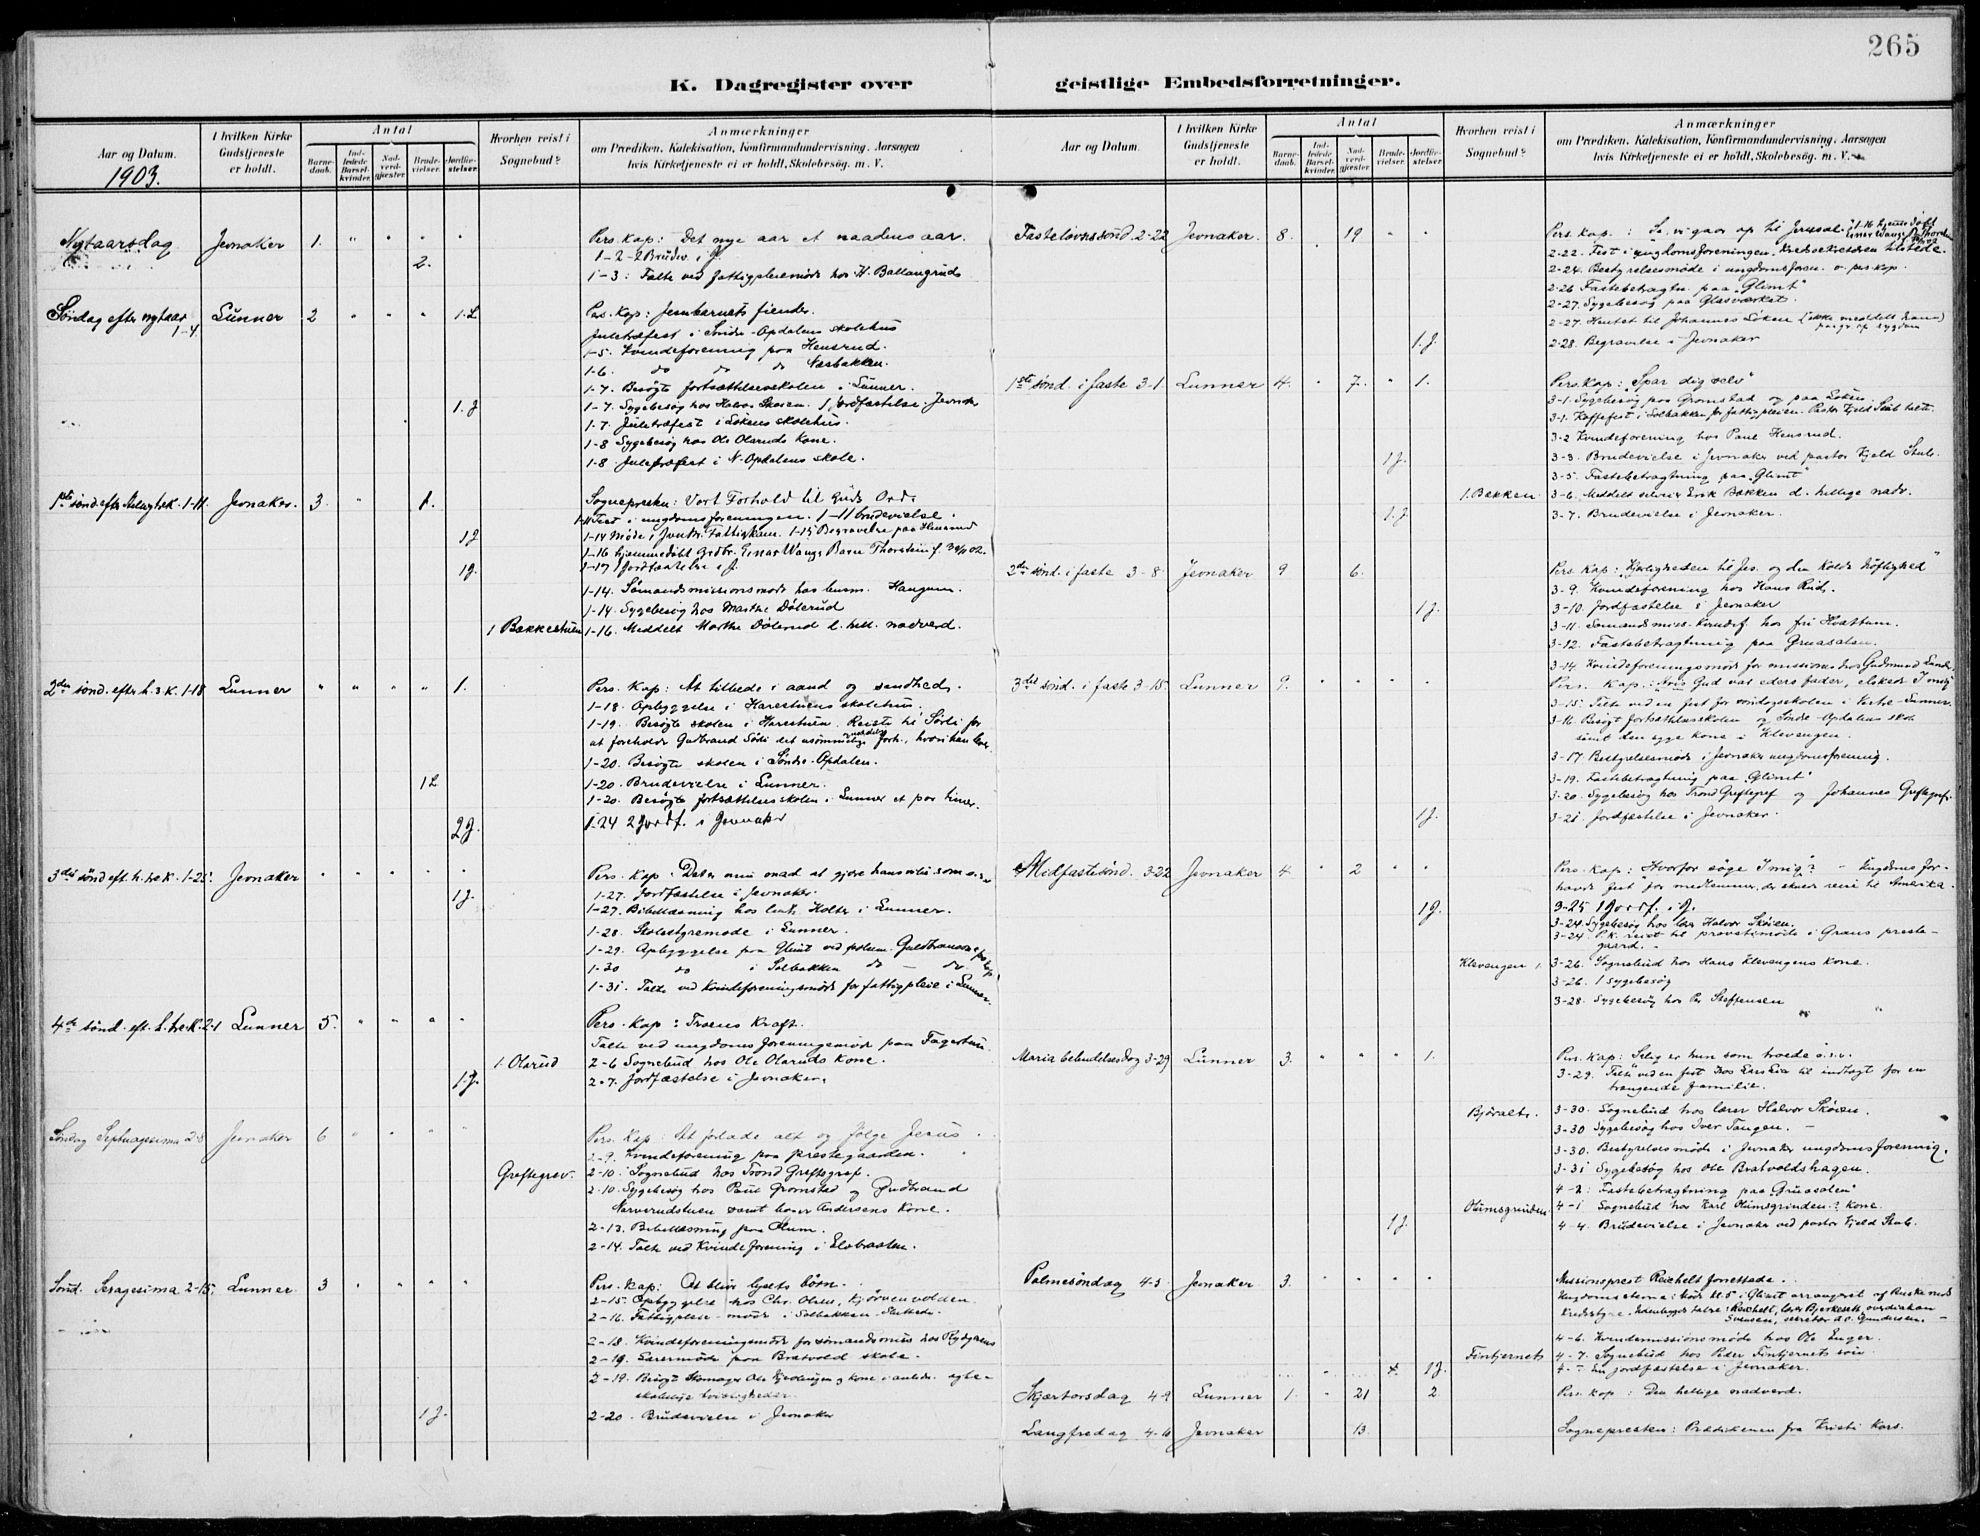 SAH, Jevnaker prestekontor, Ministerialbok nr. 11, 1902-1913, s. 265